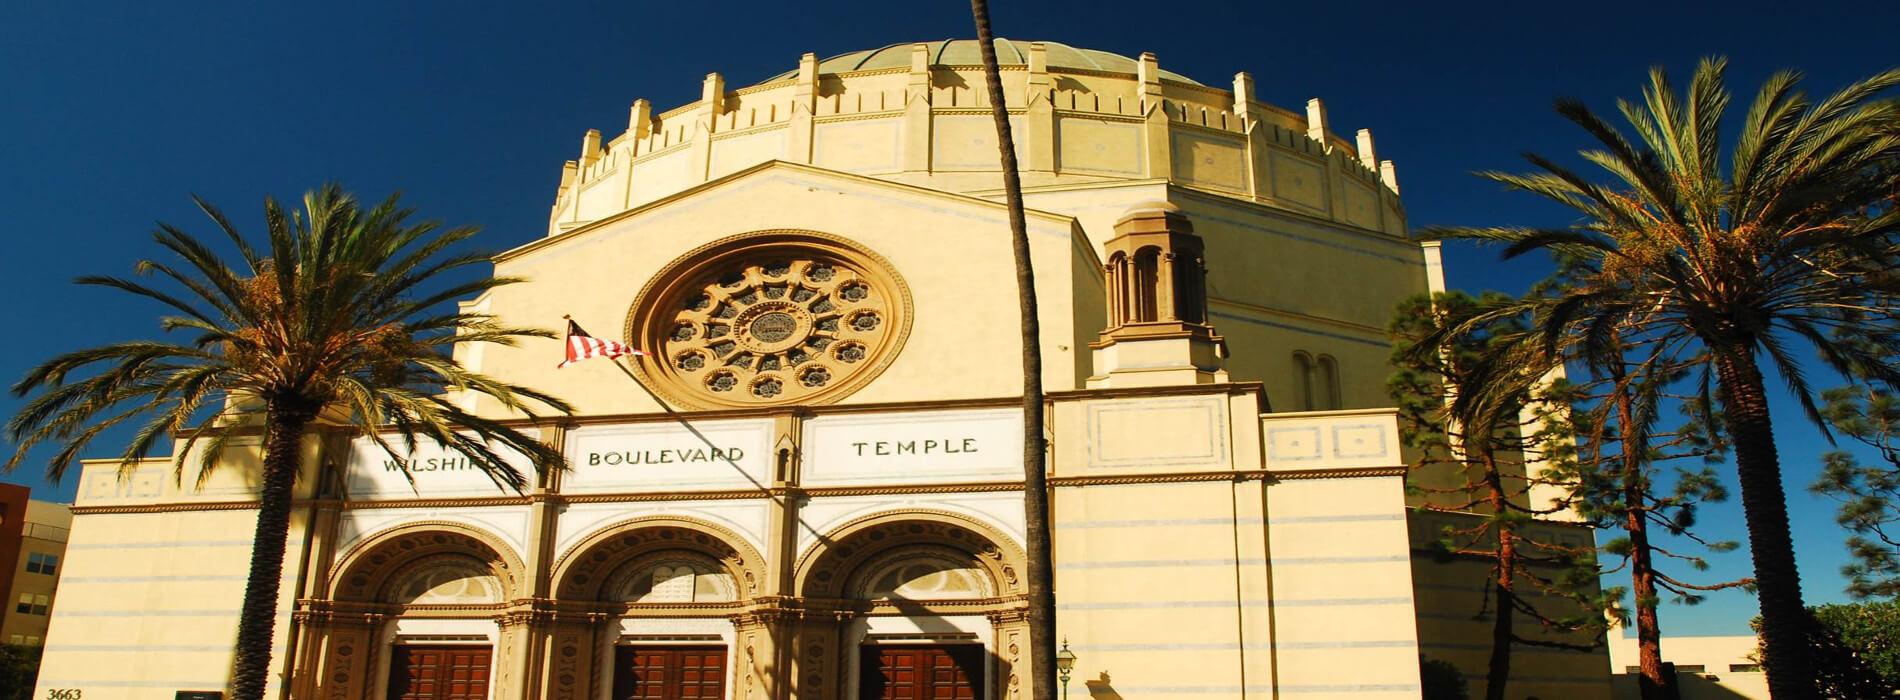 Wilshire Boulevard Temple